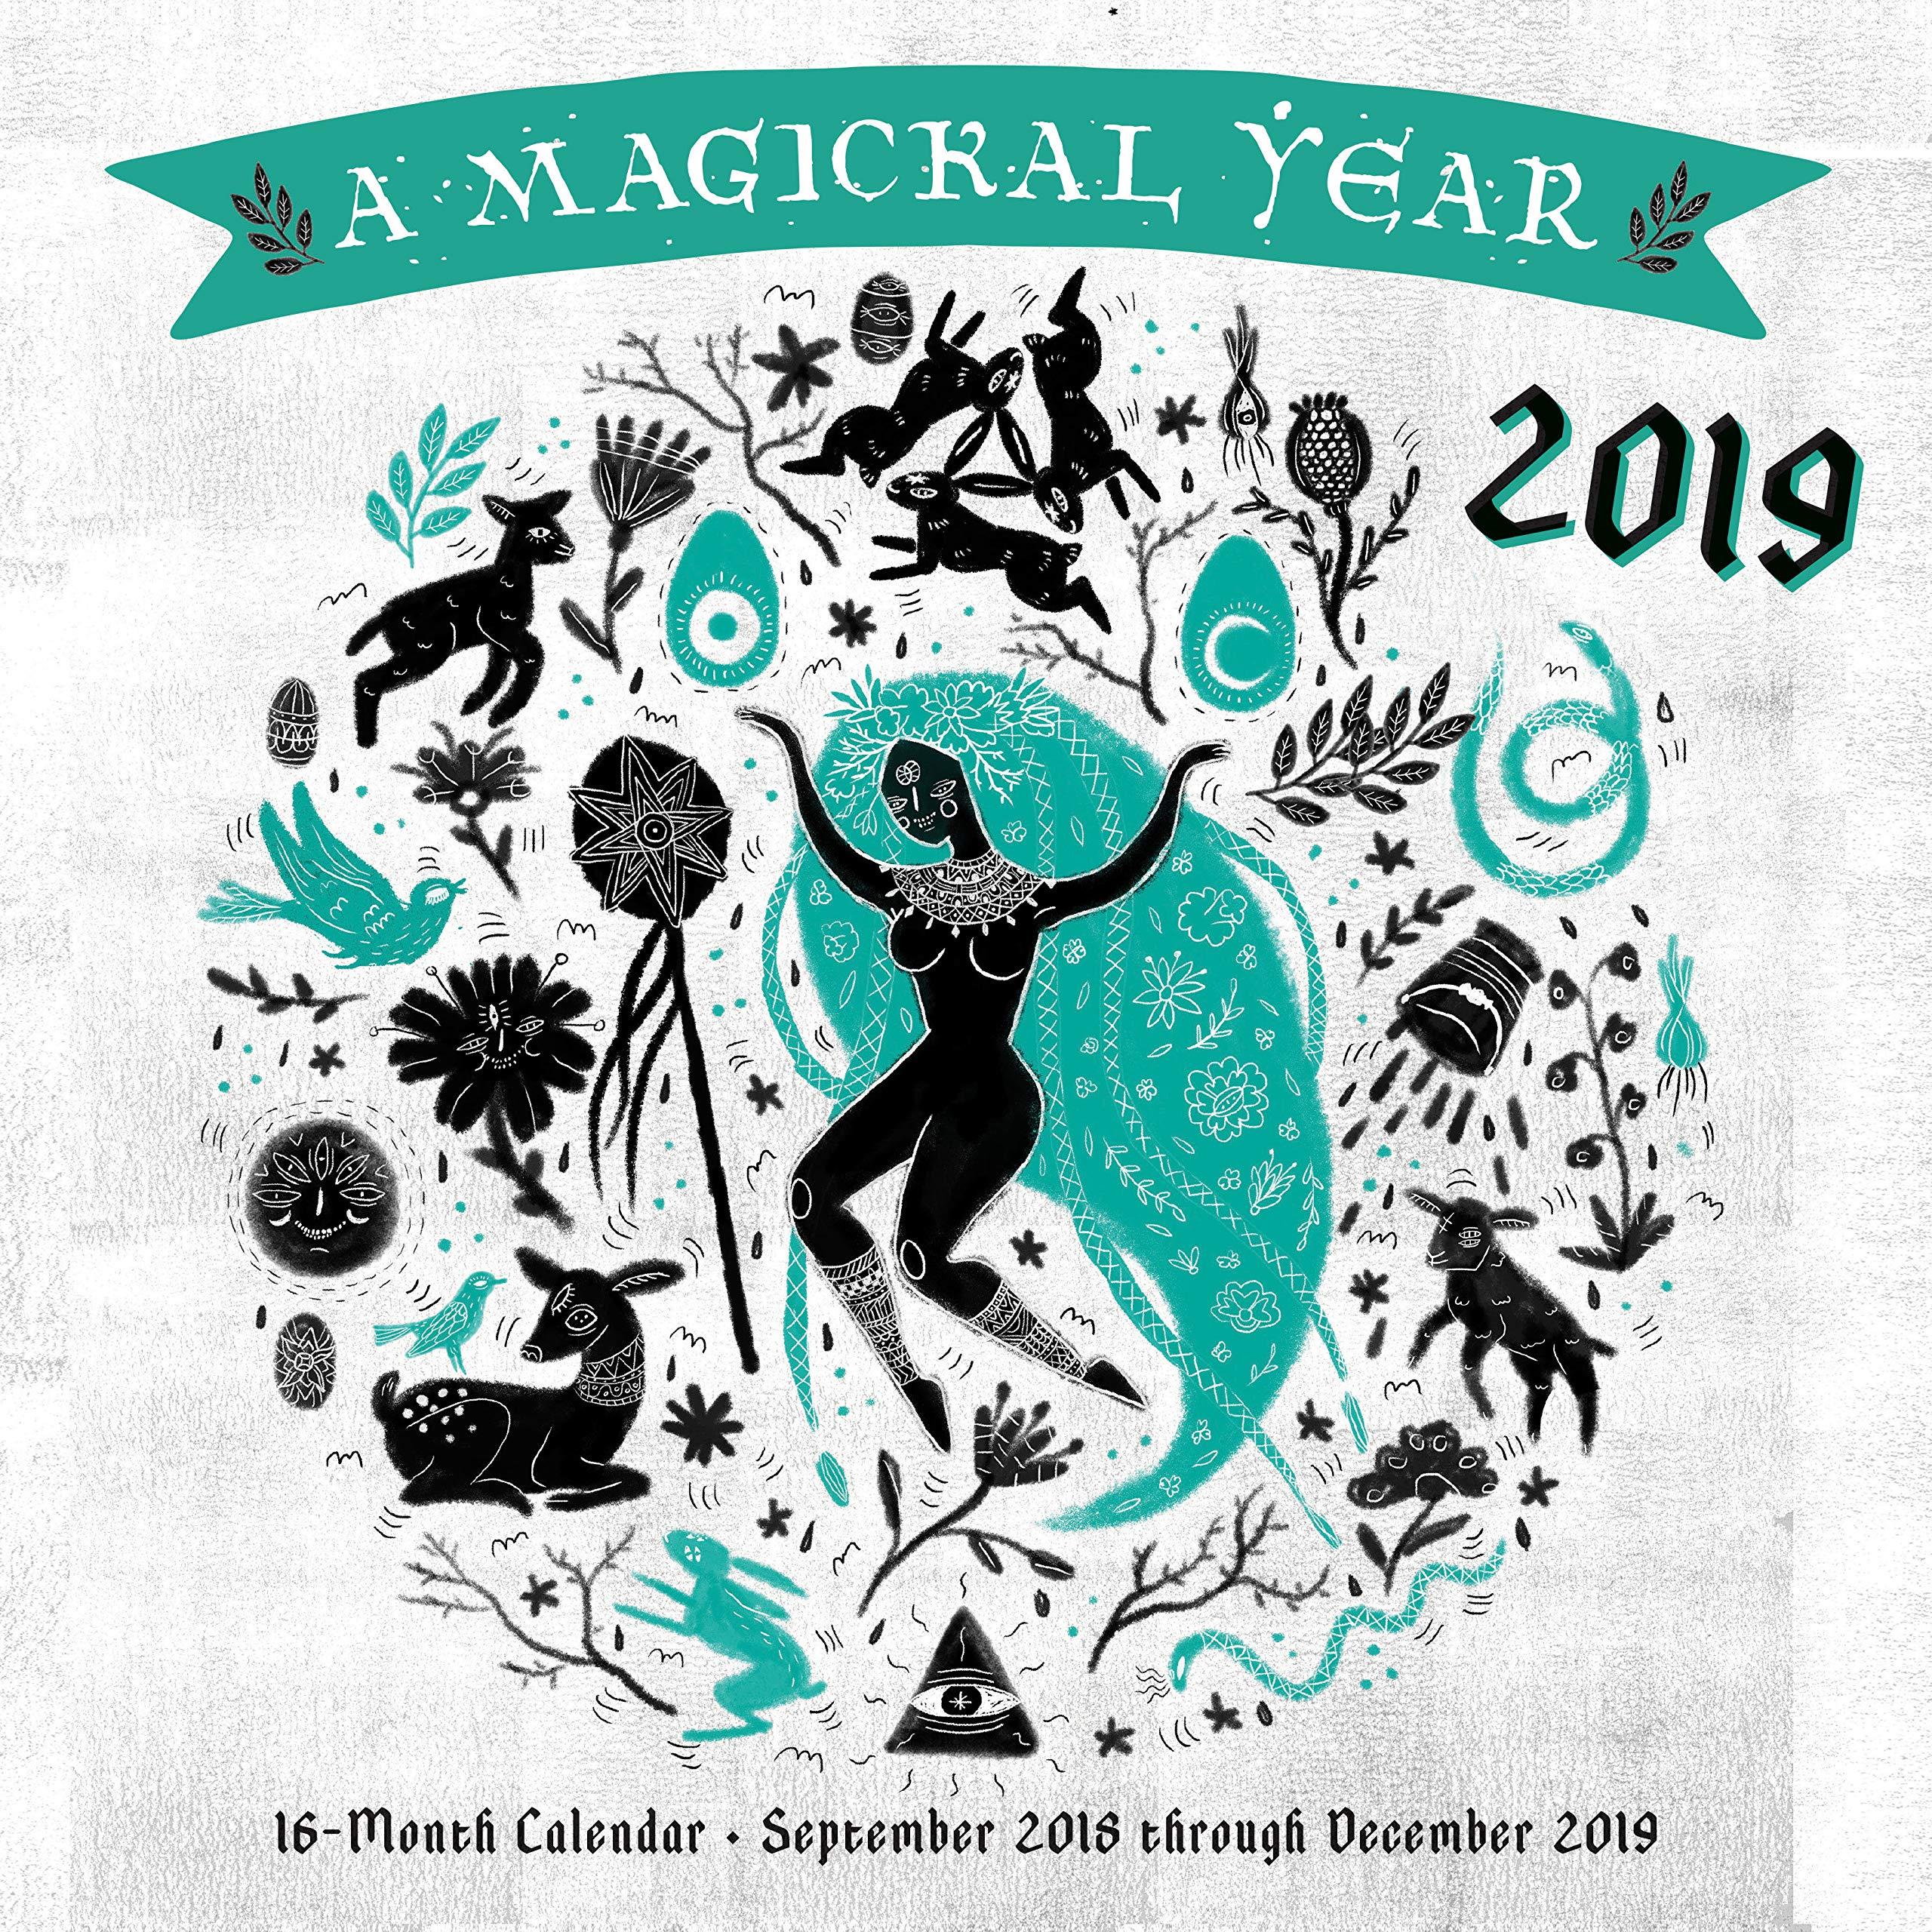 Year Calendar 2019-16 Magickal Year 2019: 16 Month Calendar   September 2018 through